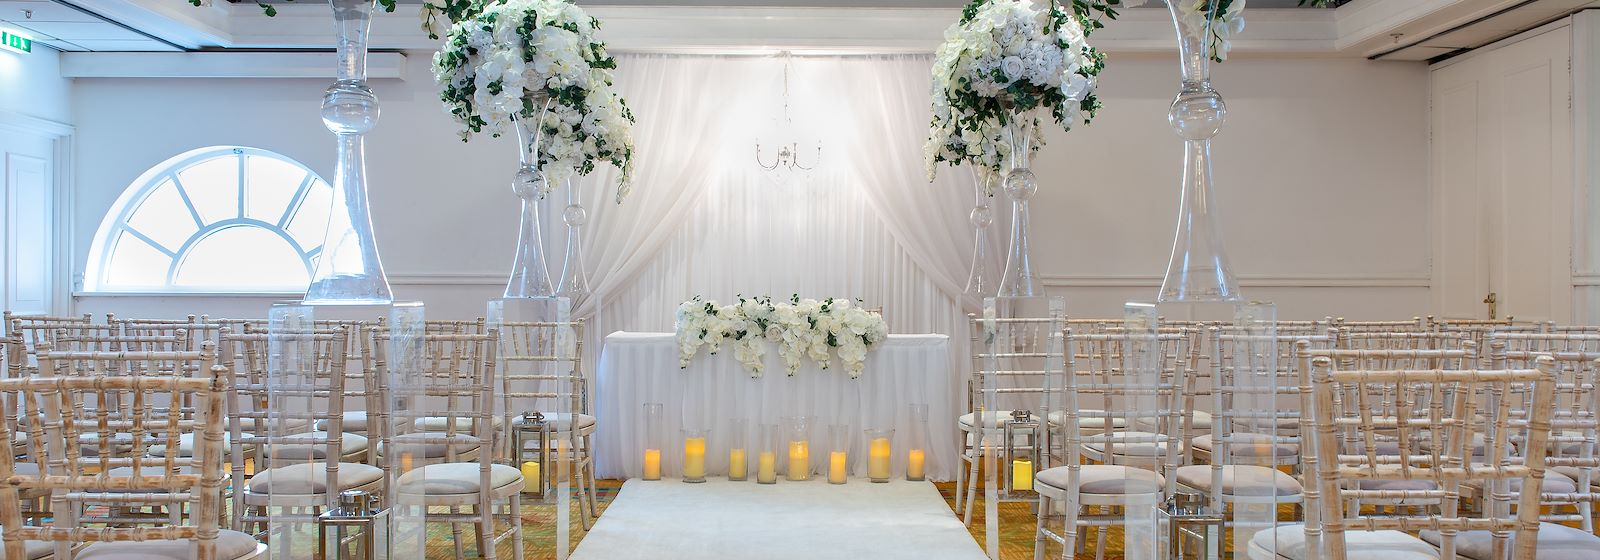 tudor park marriott wedding party function rooms